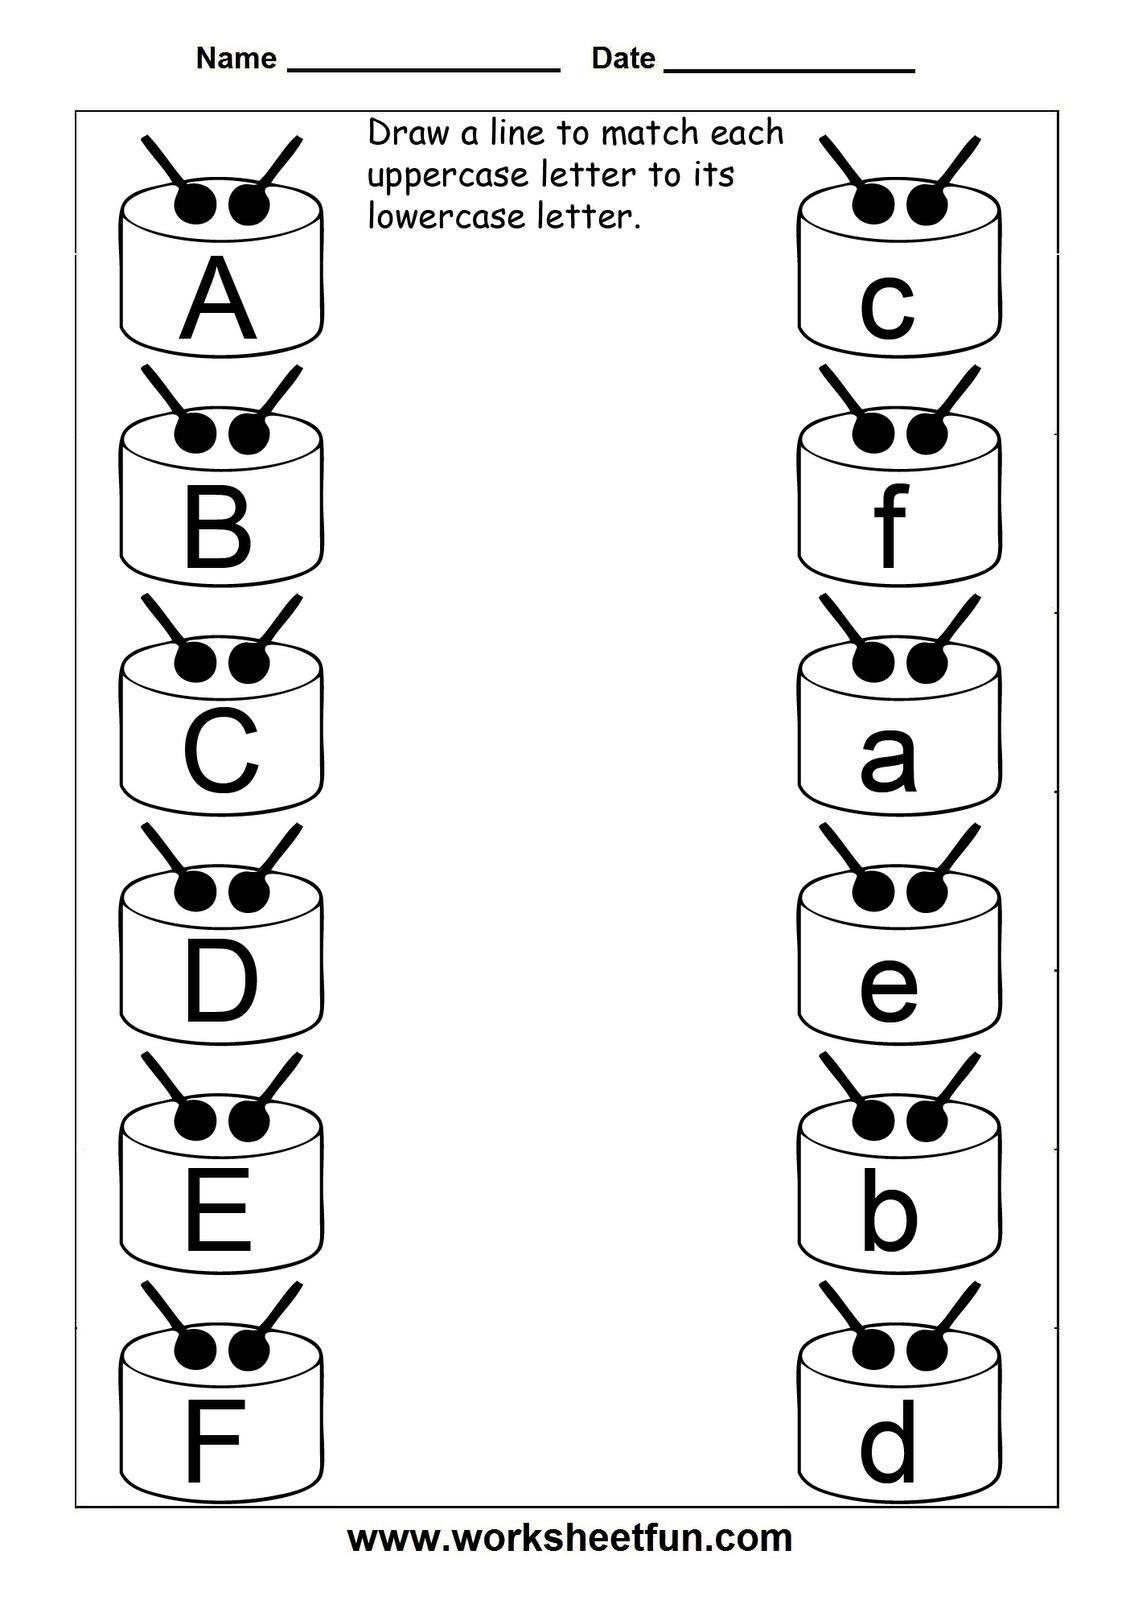 8 Uppercase And Lowercase Worksheets In 2020 Letter Worksheets Free Printable Math Worksheets Preschool Worksheets